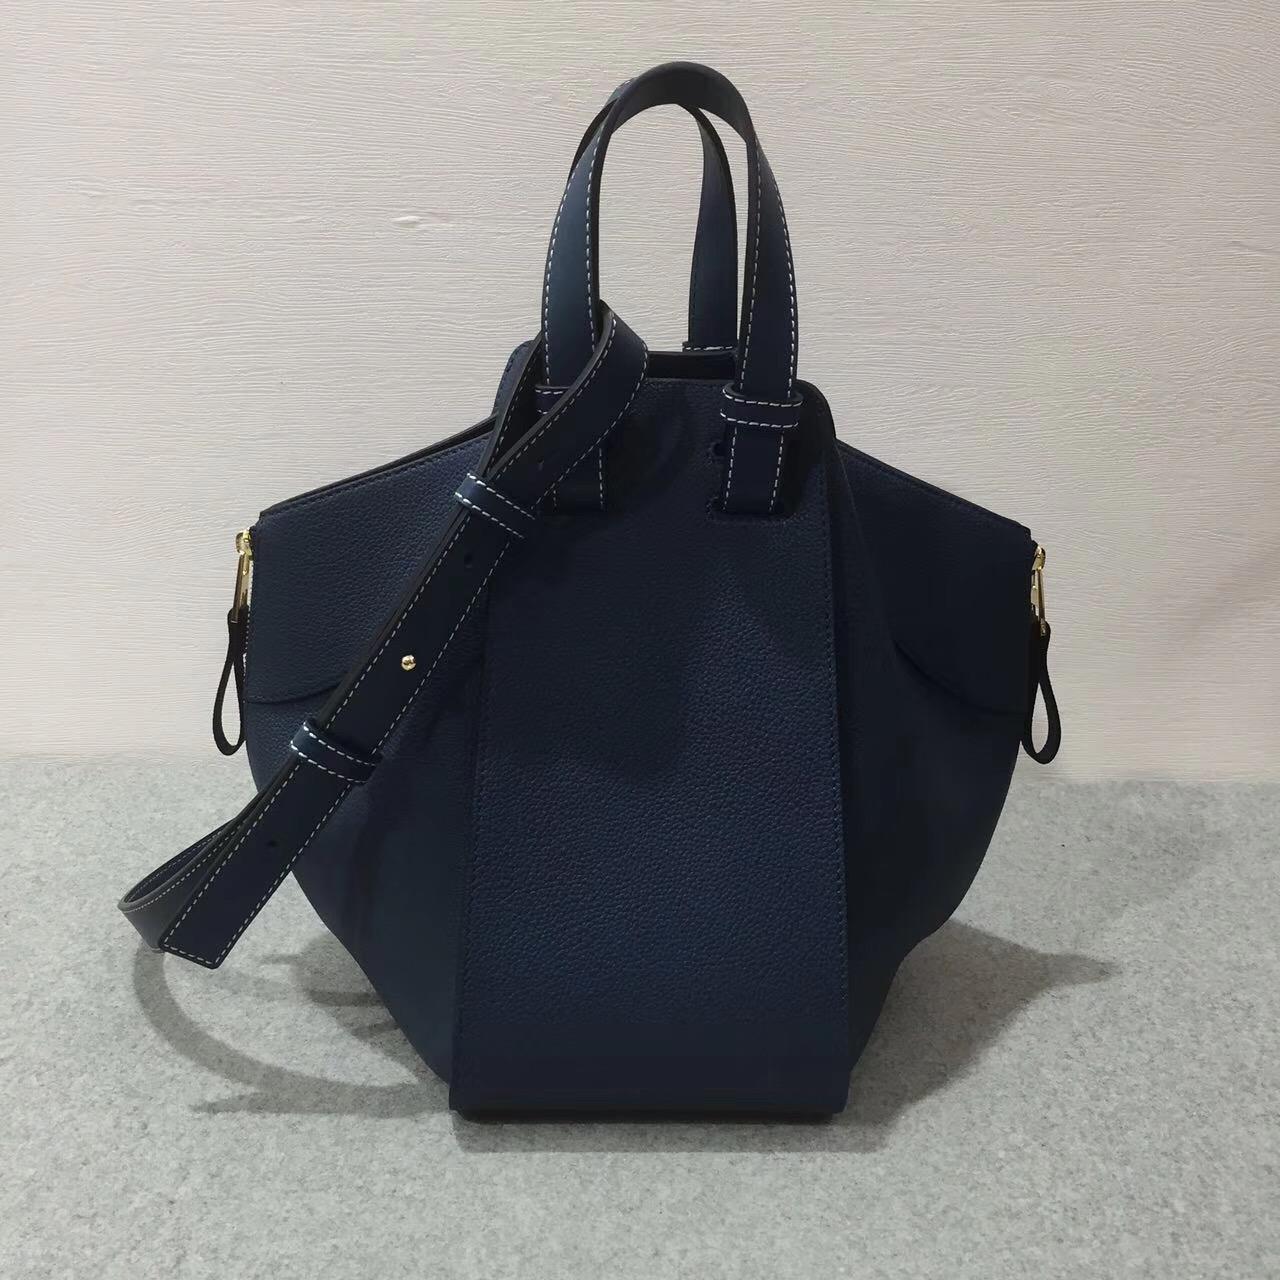 Loewe羅意威 Hammock Small Bag 顆粒小牛皮 靛藍色吊床包